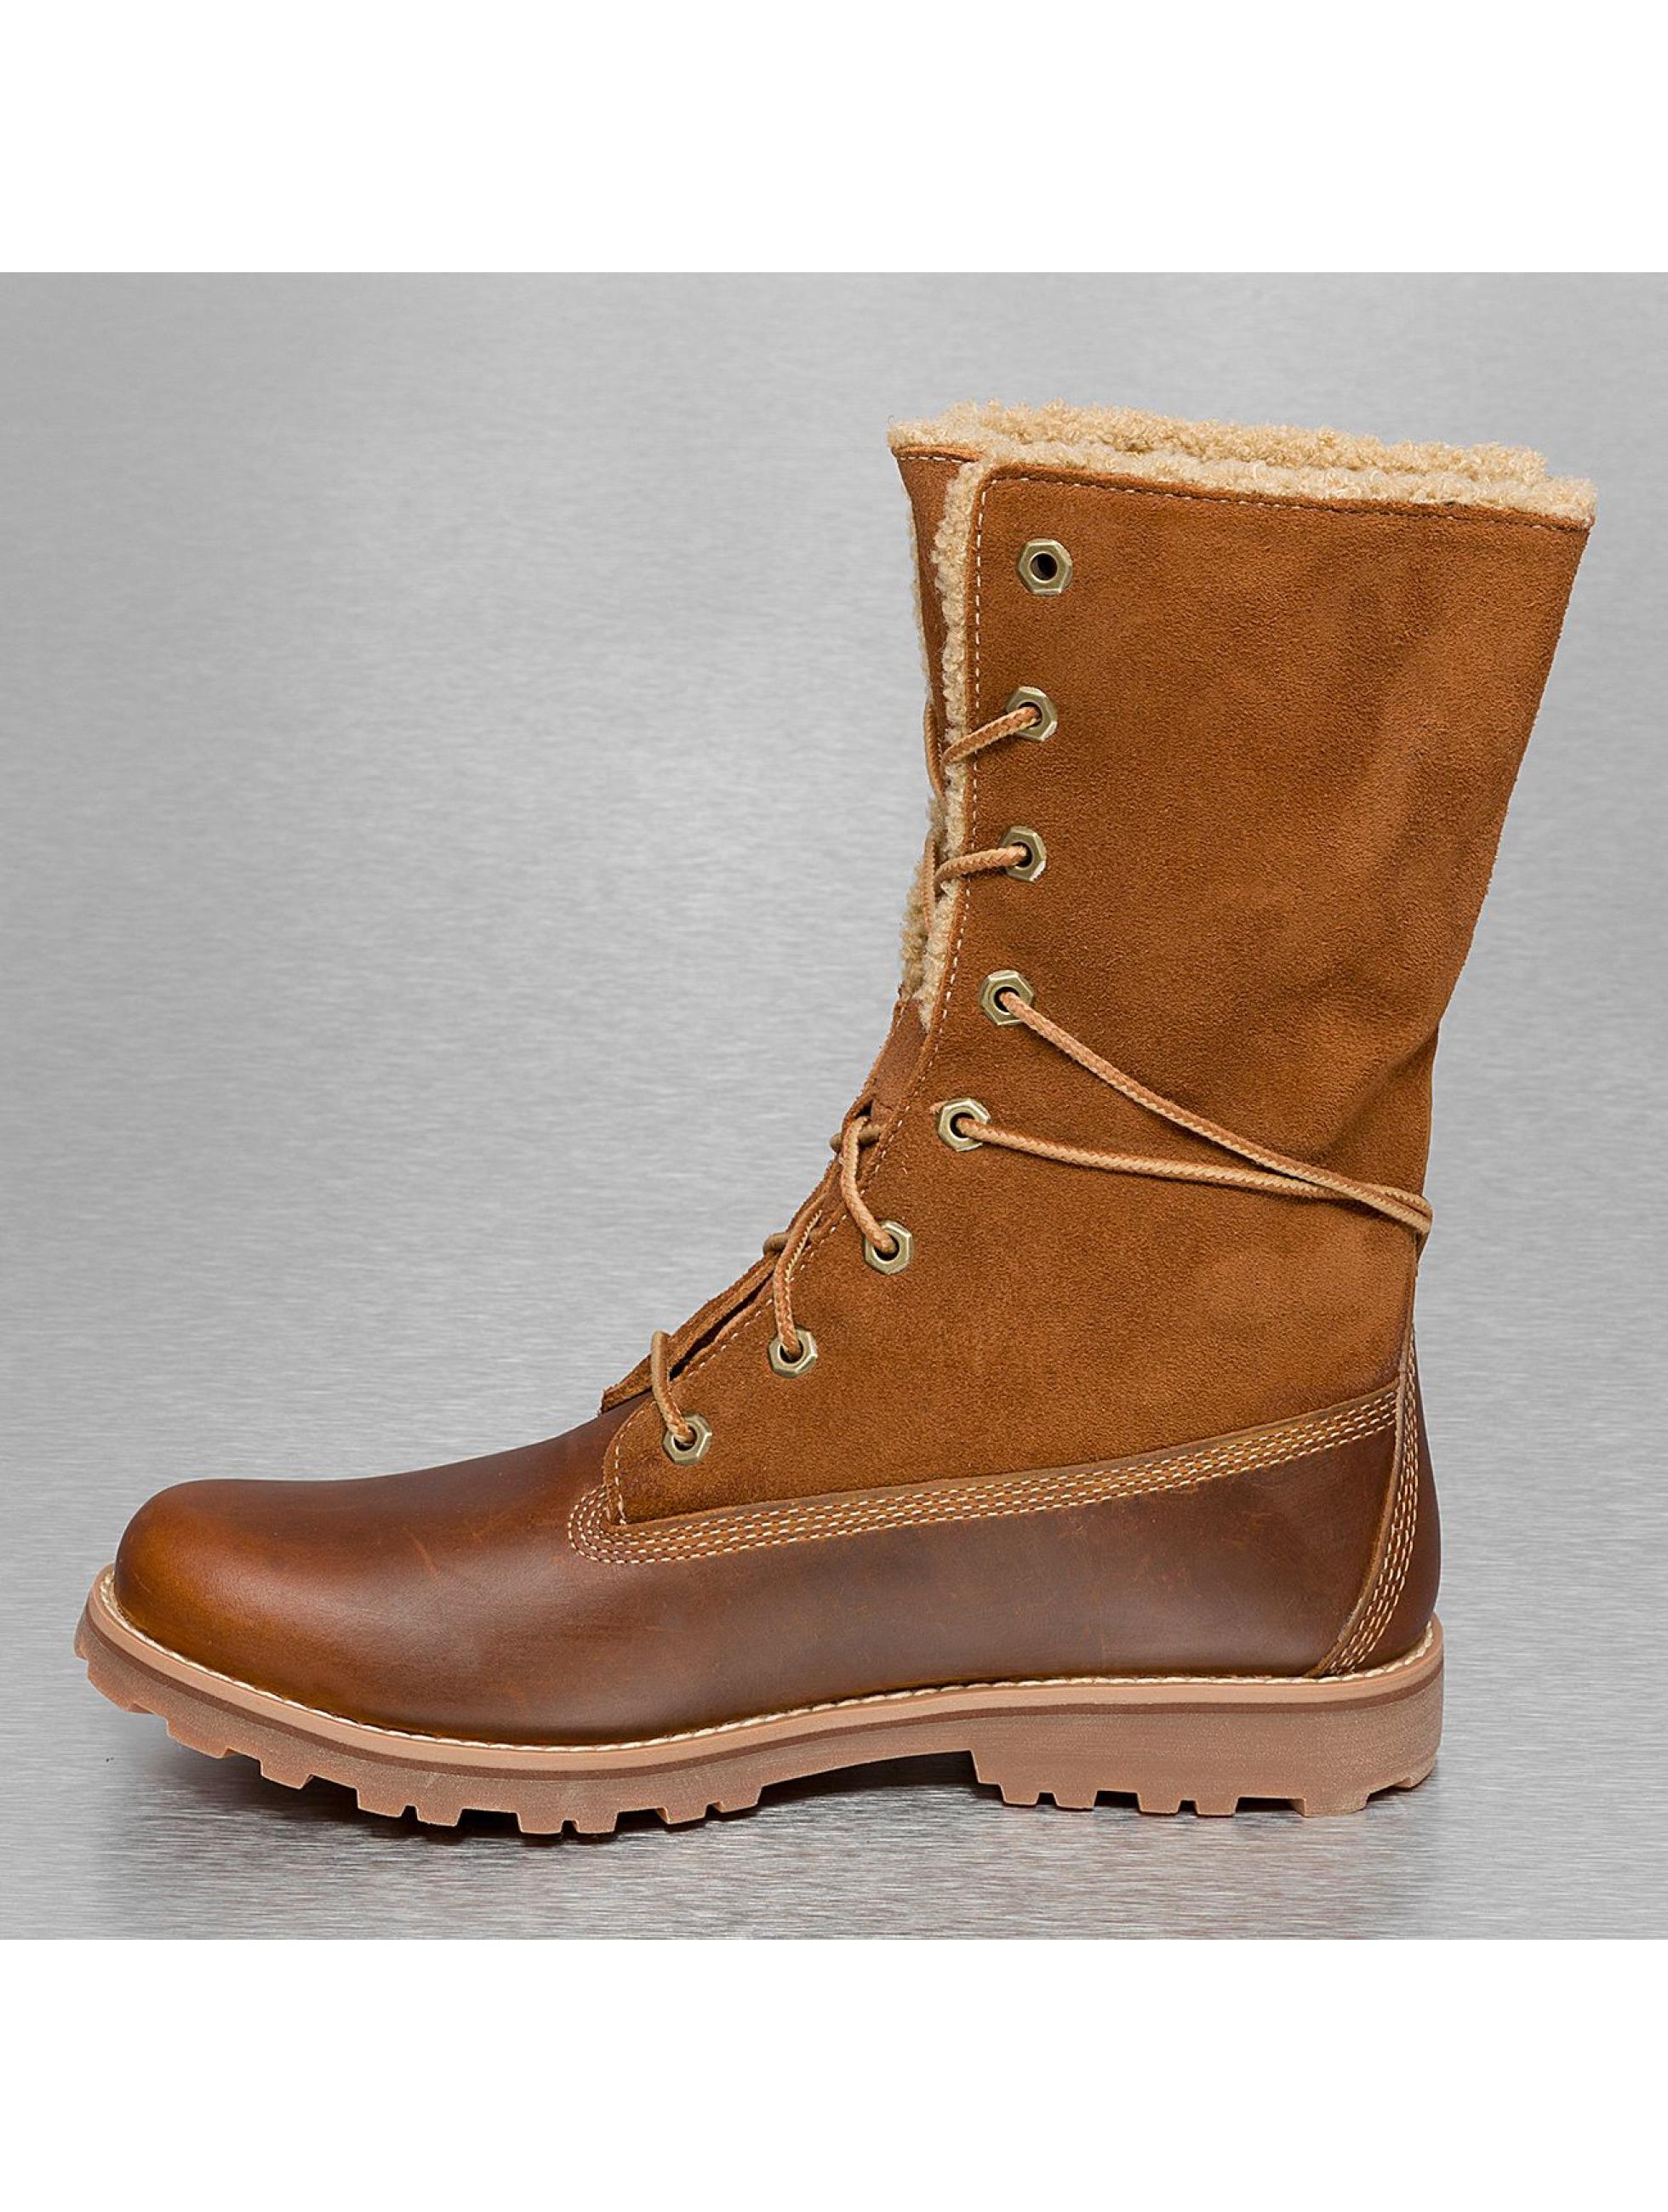 Timberland Vapaa-ajan kengät Authentics 6 In Shearling ruskea